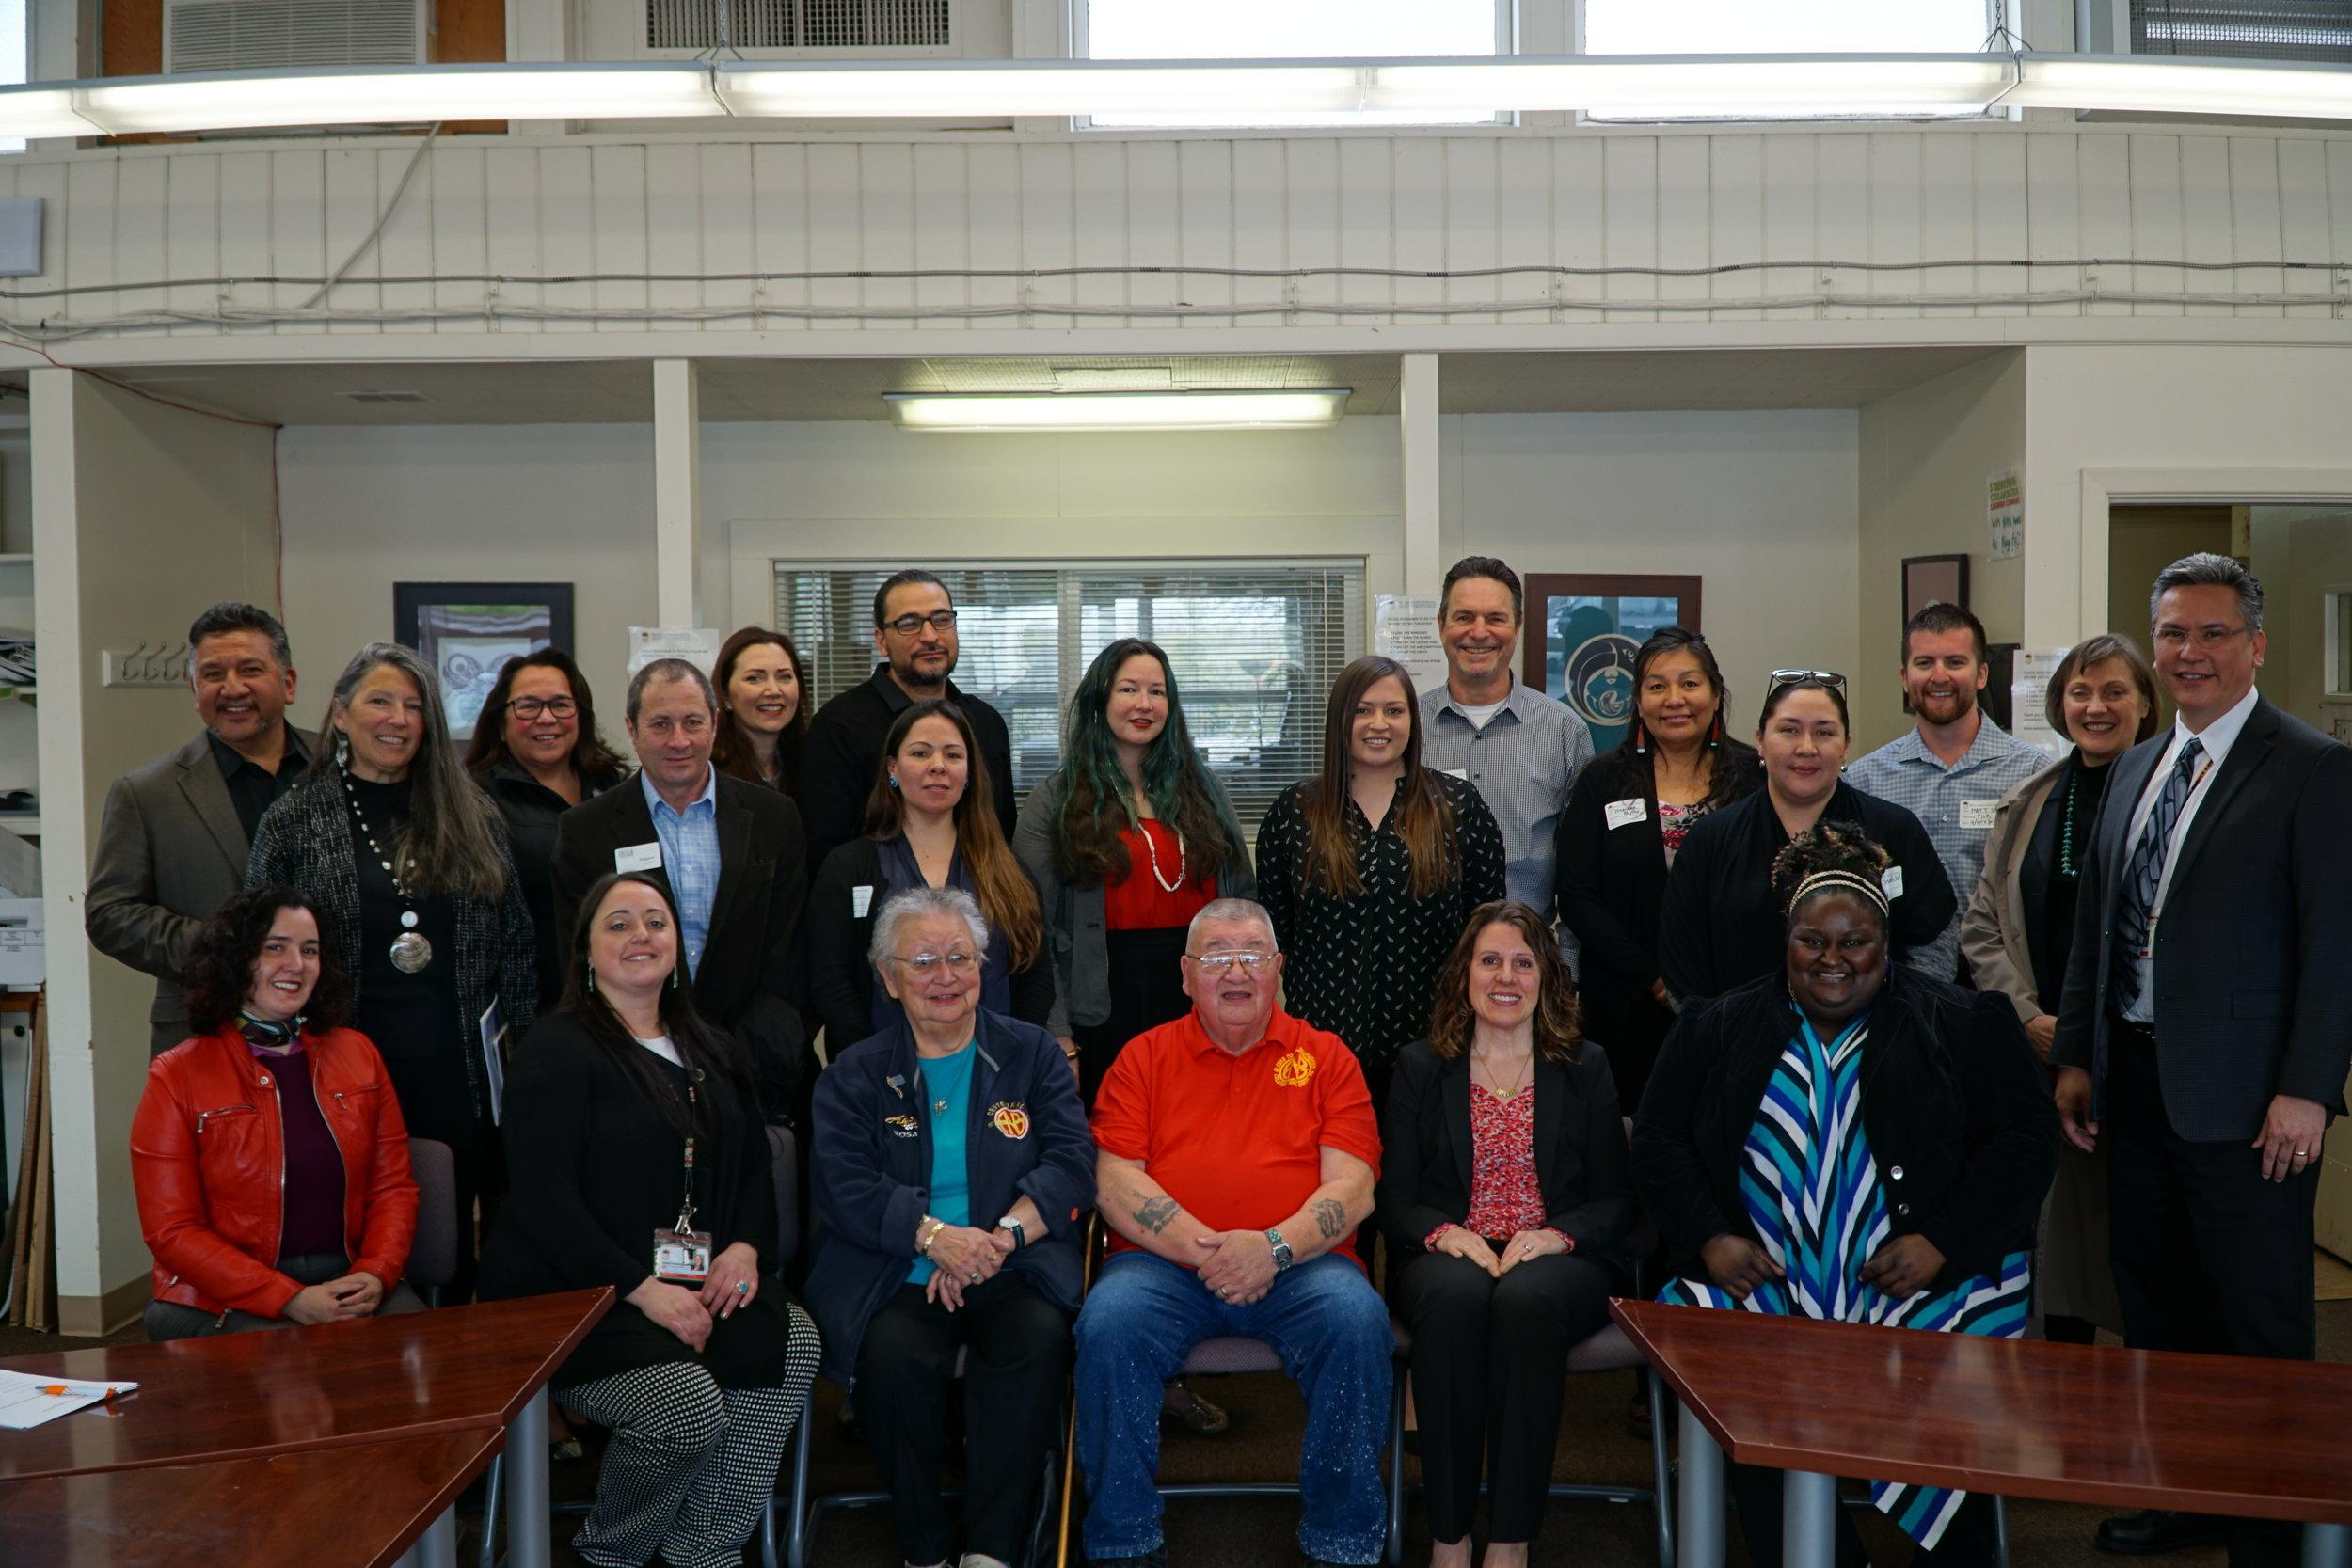 PORTLAND INDIAN LEADERS ROUNDTABLE - Meeting with Multnomah County Chair Deborah Kafoury.